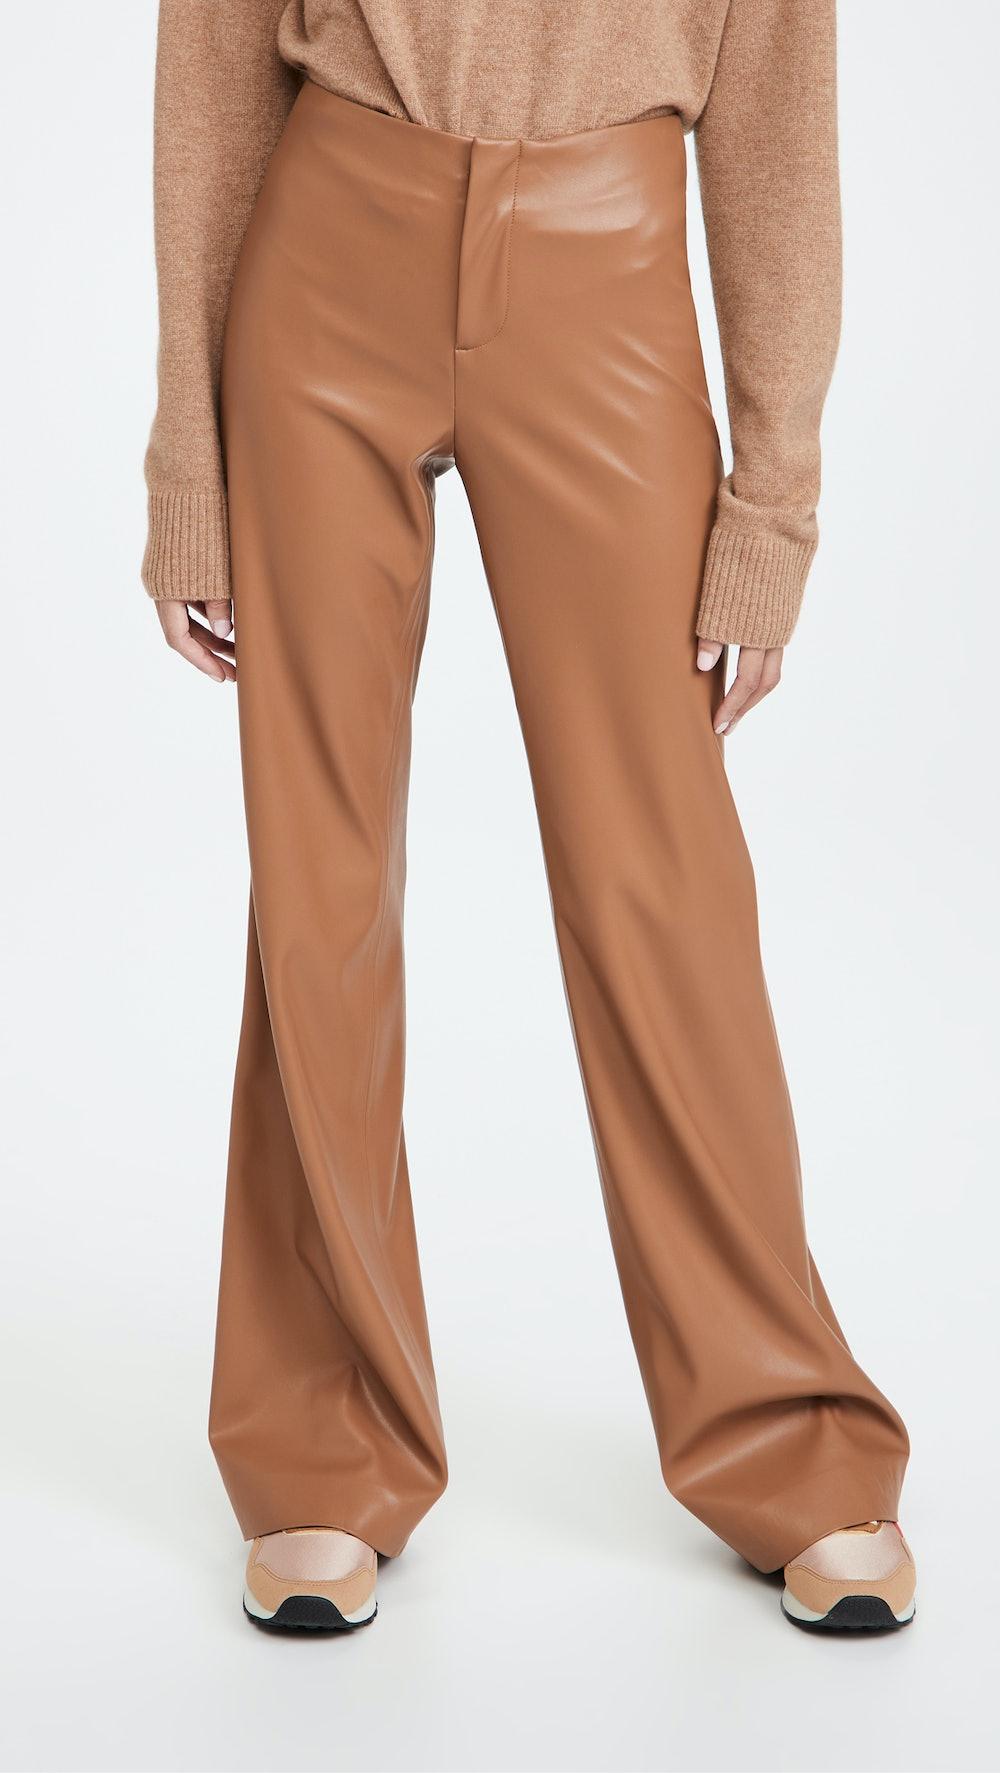 Lorinda Super High Waisted Pants